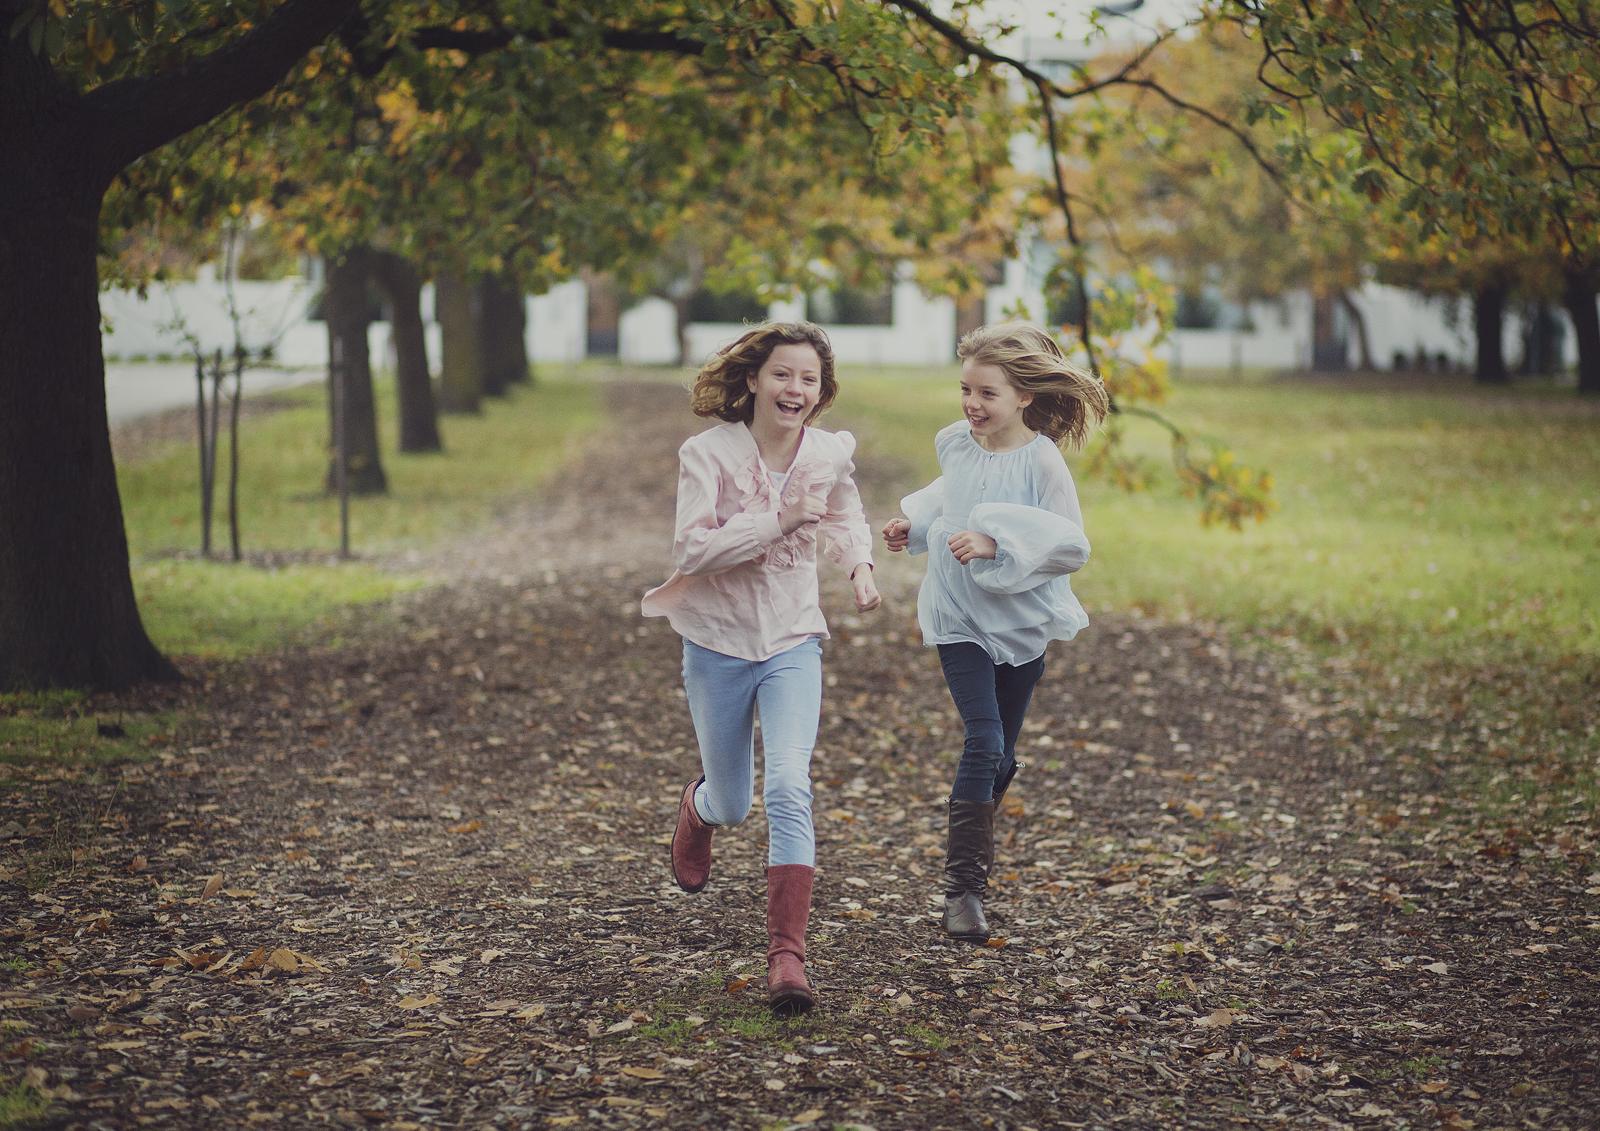 Children running at the park!